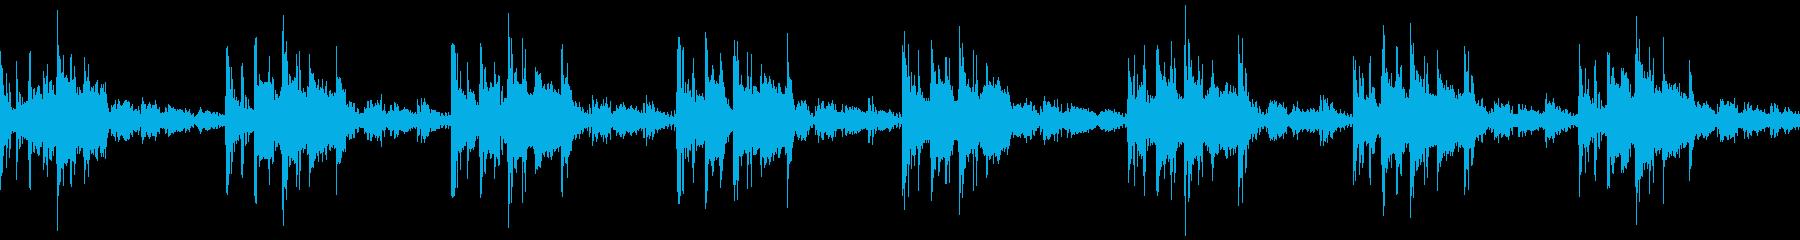 Robot / SF game loop BGM1's reproduced waveform